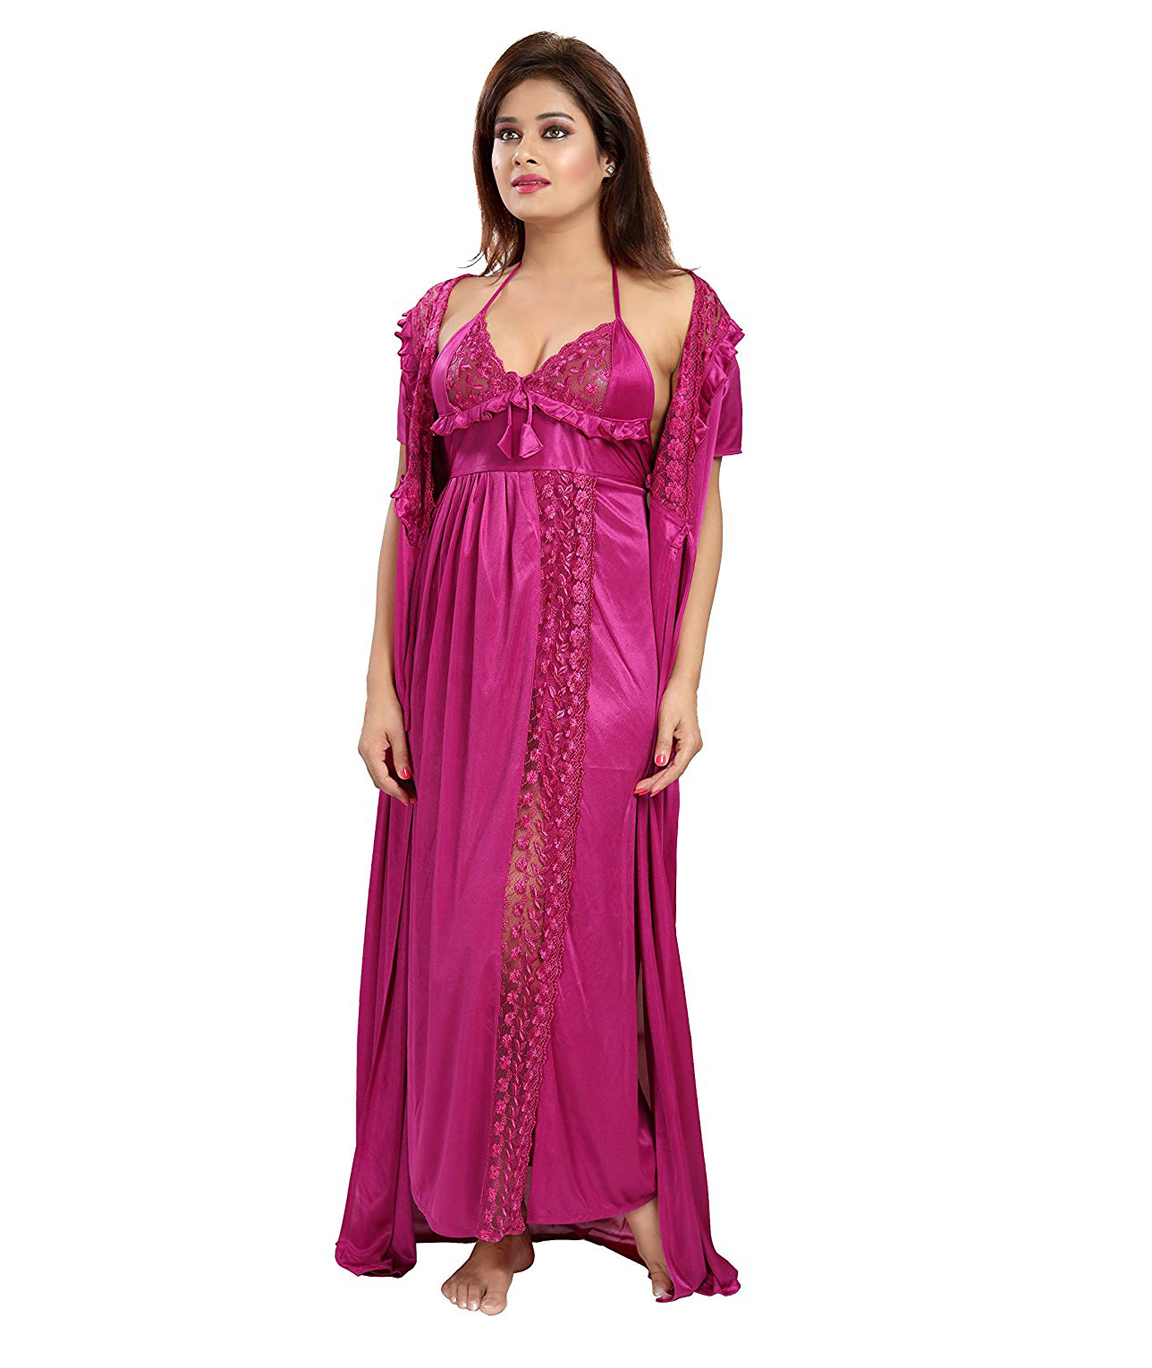 Romaisa Women`s Satin Nightwear Set of 6 Pcs Nighty, Wrap Gown, Top, Capri, Bra & Thong (Size - Small, Medium, Large) (Pack of 6) COLOUR : DARK MAGENTA